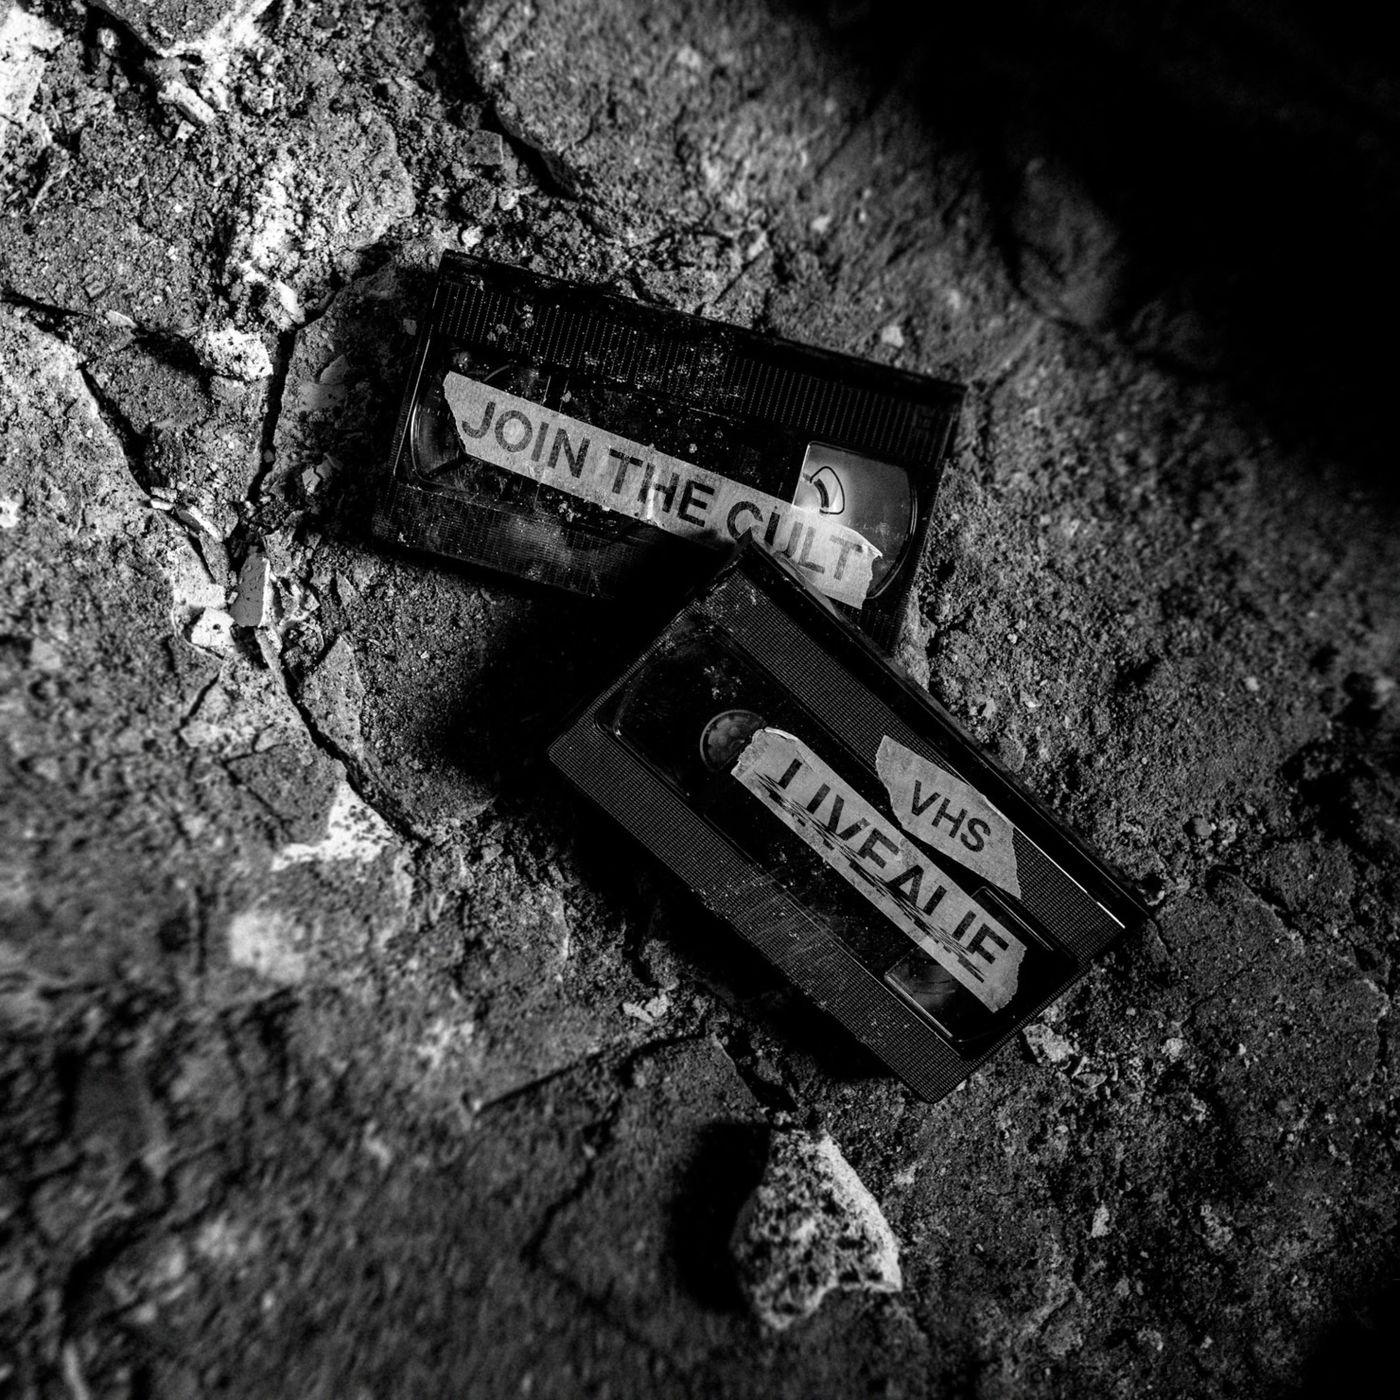 Livealie - VHS [single] (2020)